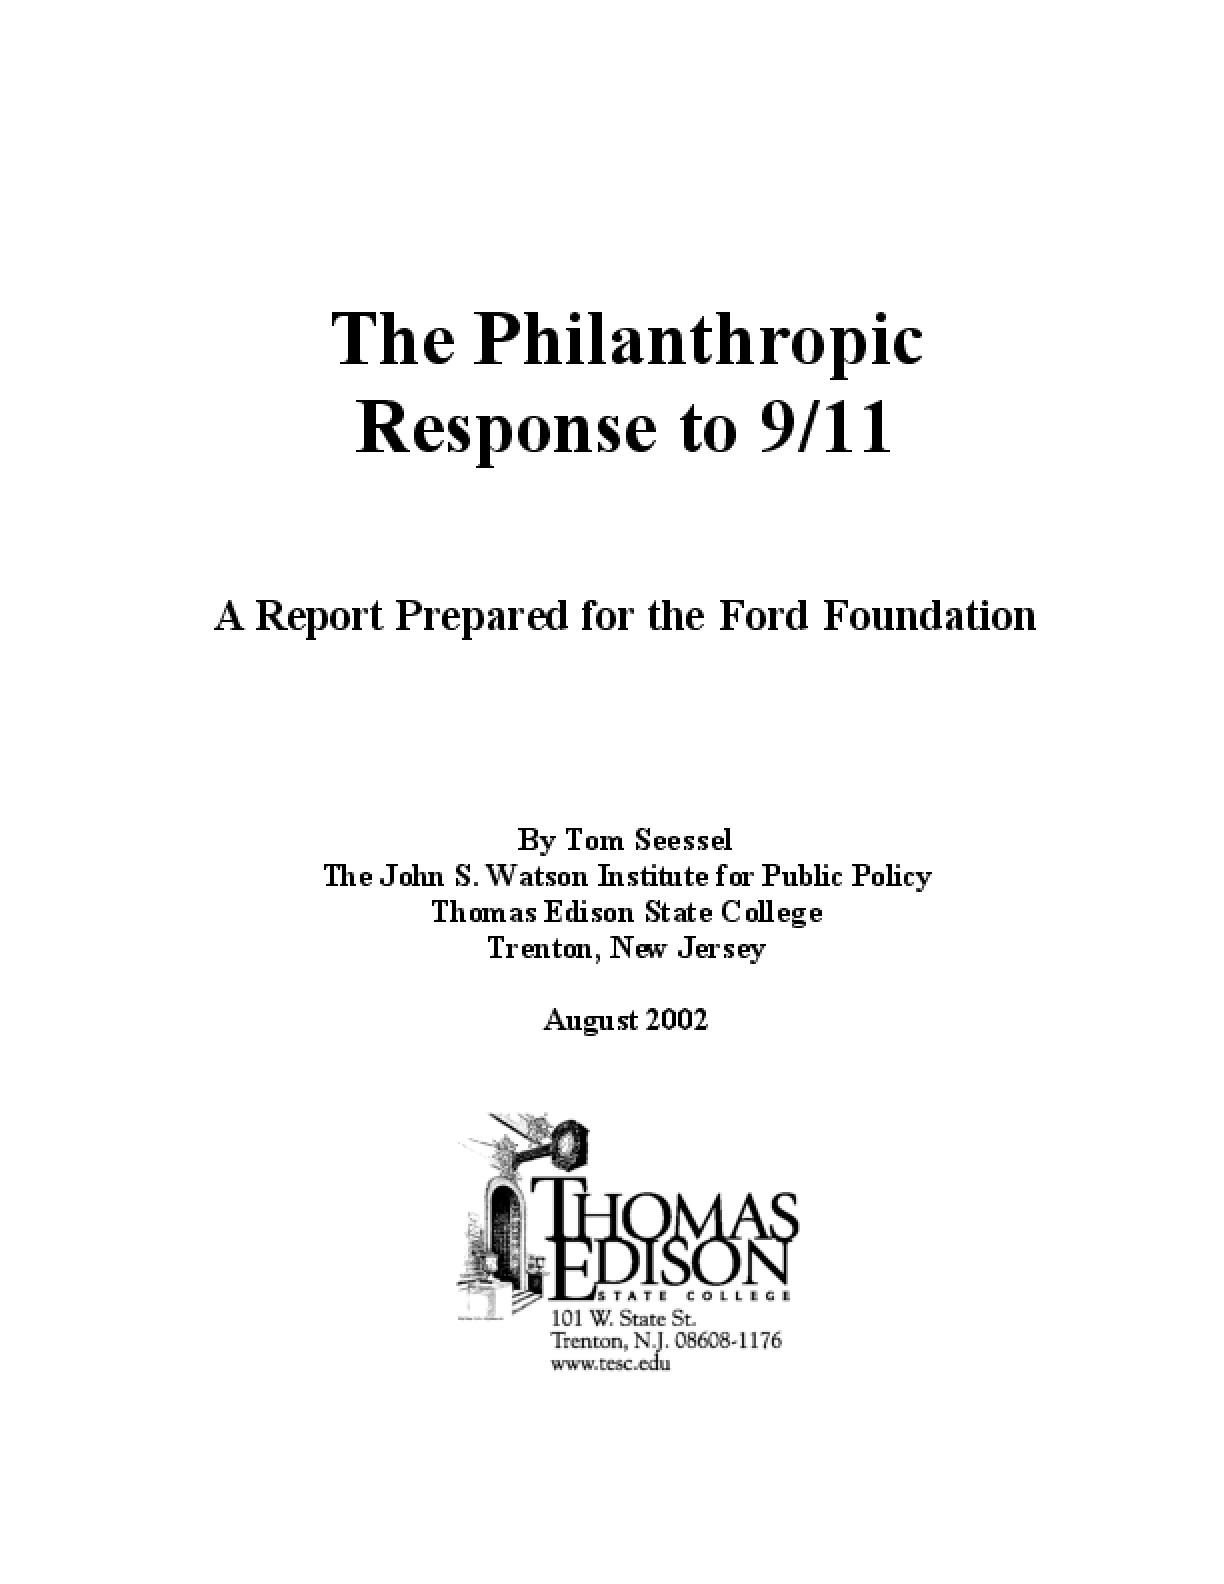 The Philanthropic Response to 9/11